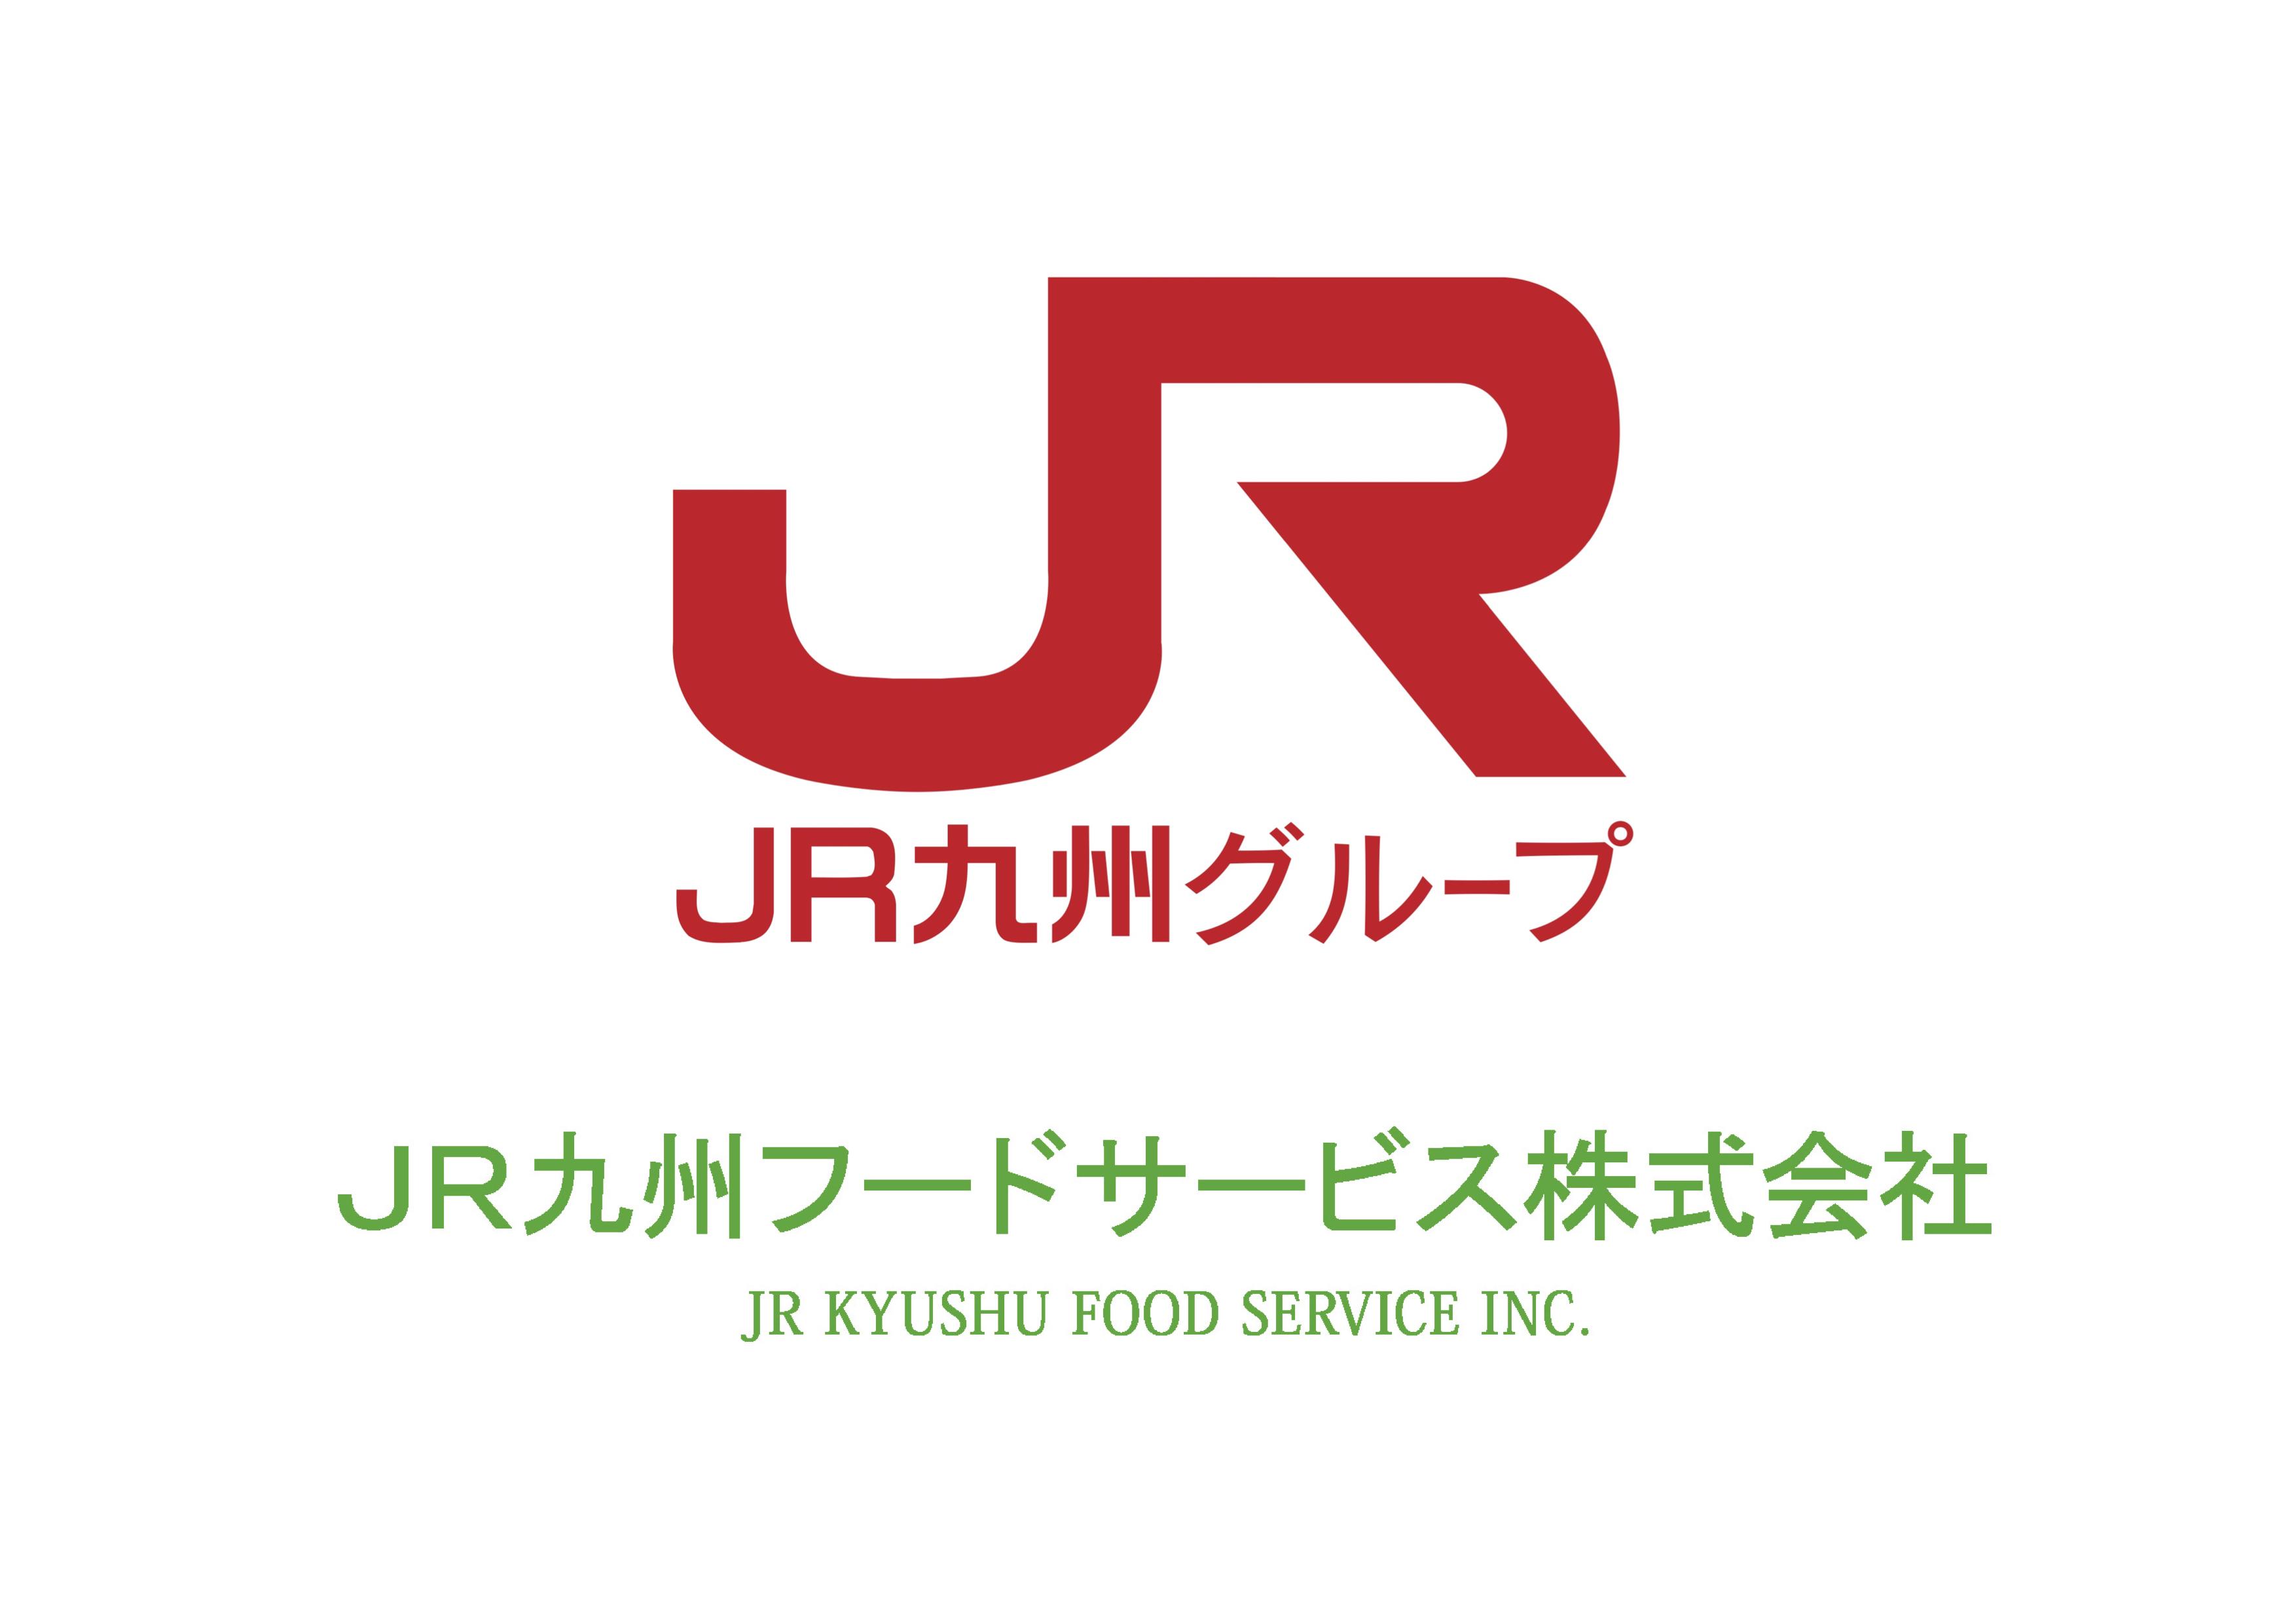 「JR九州フードサービス株式会社」が運営する、多彩な業態の店舗でキッチンスタッフを募集します。